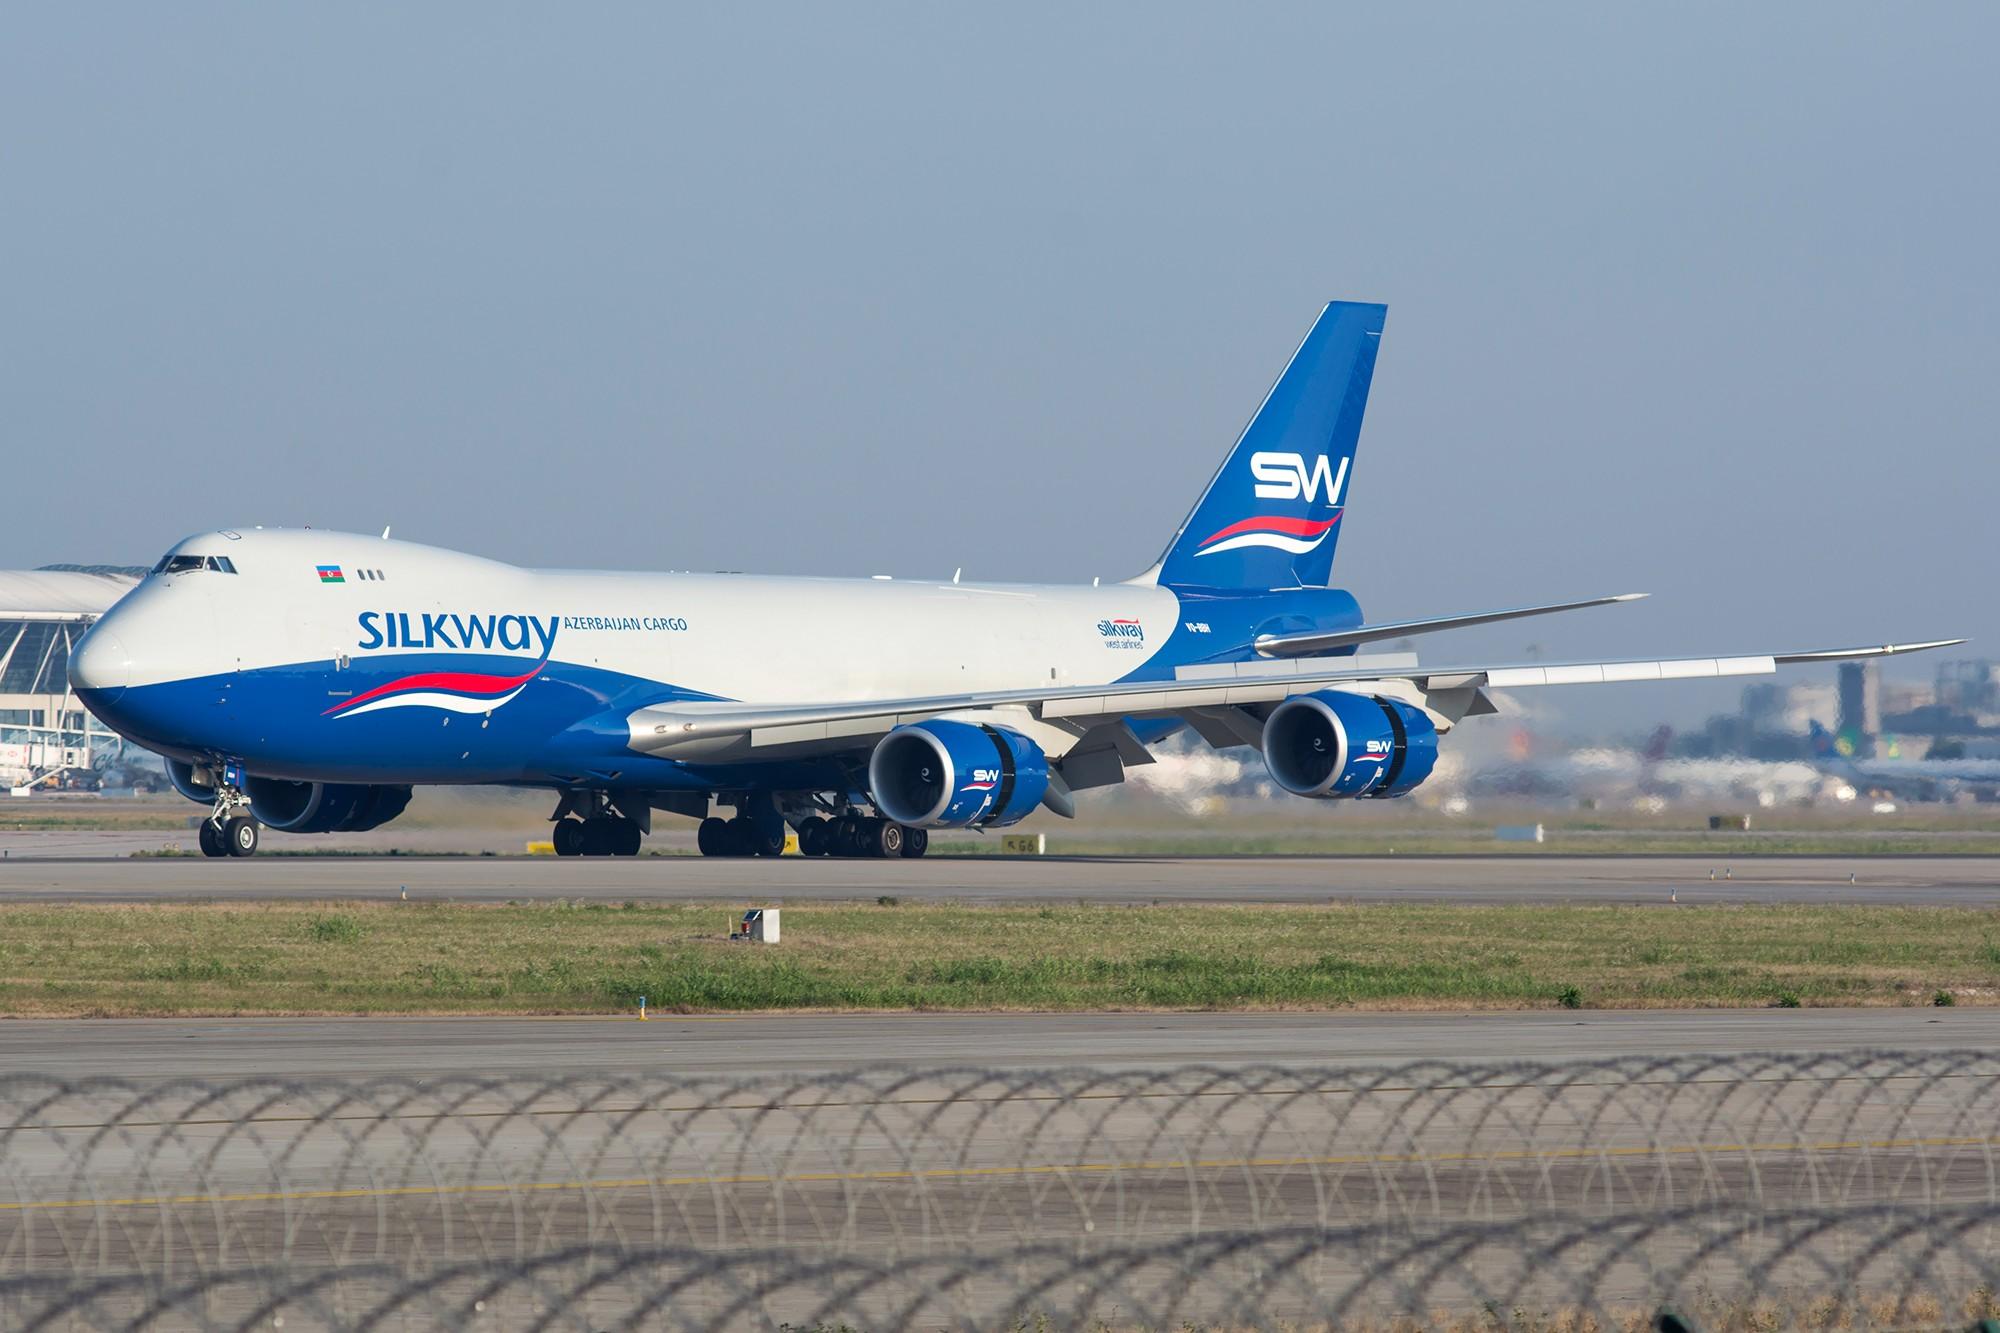 [PVG] 首见丝路航空B748,早起的鸟儿有虫吃! BOEING 747-8F VQ-BBH 中国上海浦东国际机场